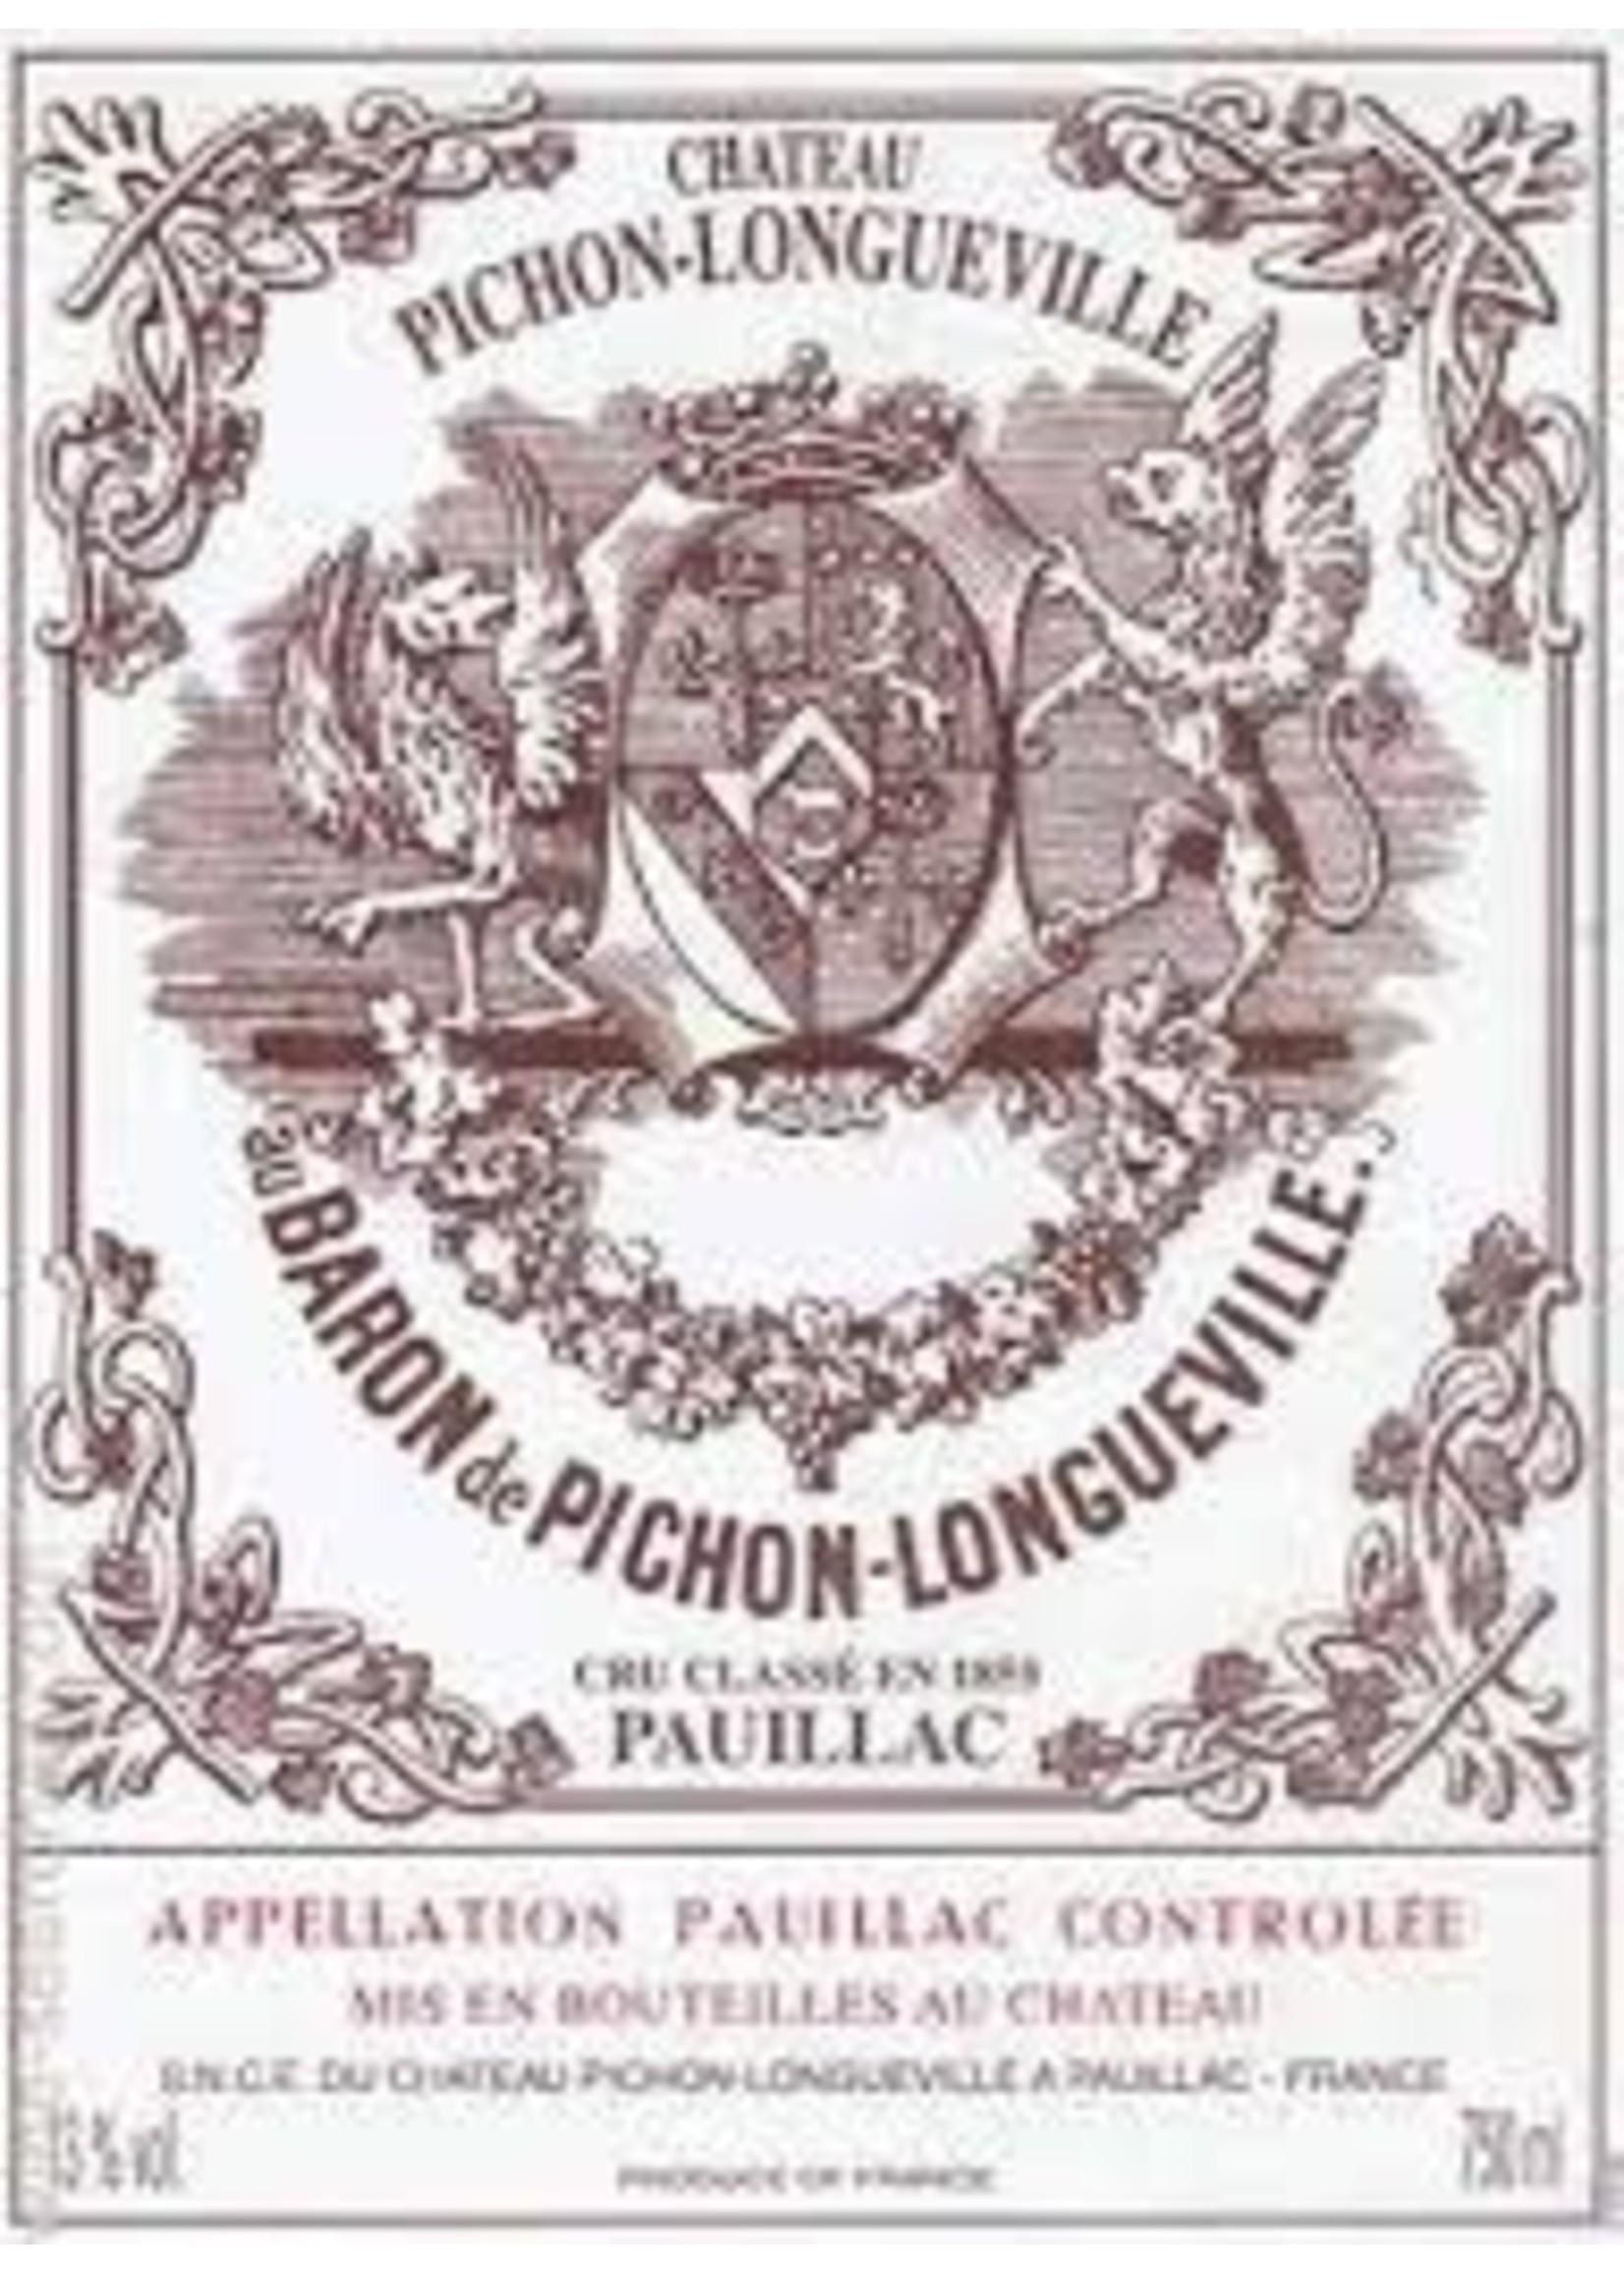 Chateau Pichon-Longueville Baron 2009 Pauillac 750ml [PRE-ARRIVAL]